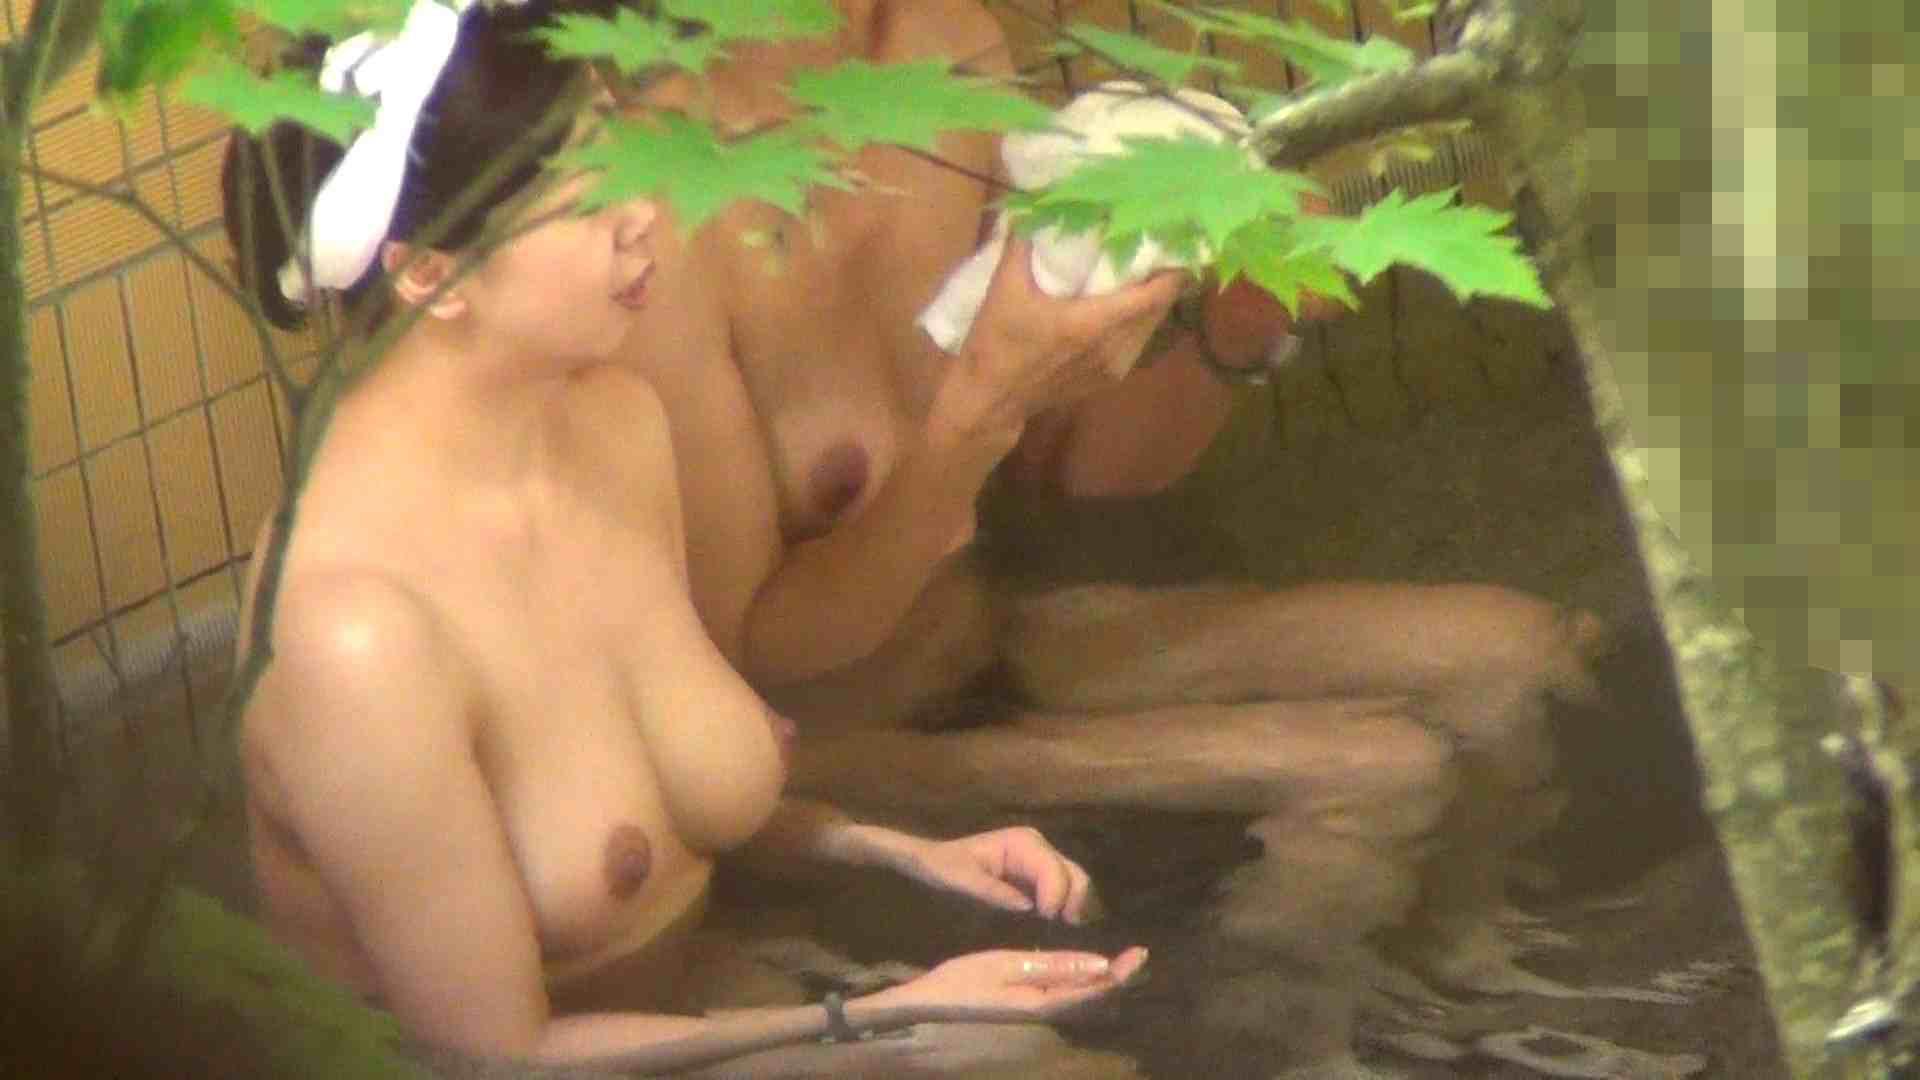 Vol.29 ピンクとブラウンの爆乳コンビ 美女  76PIX 40